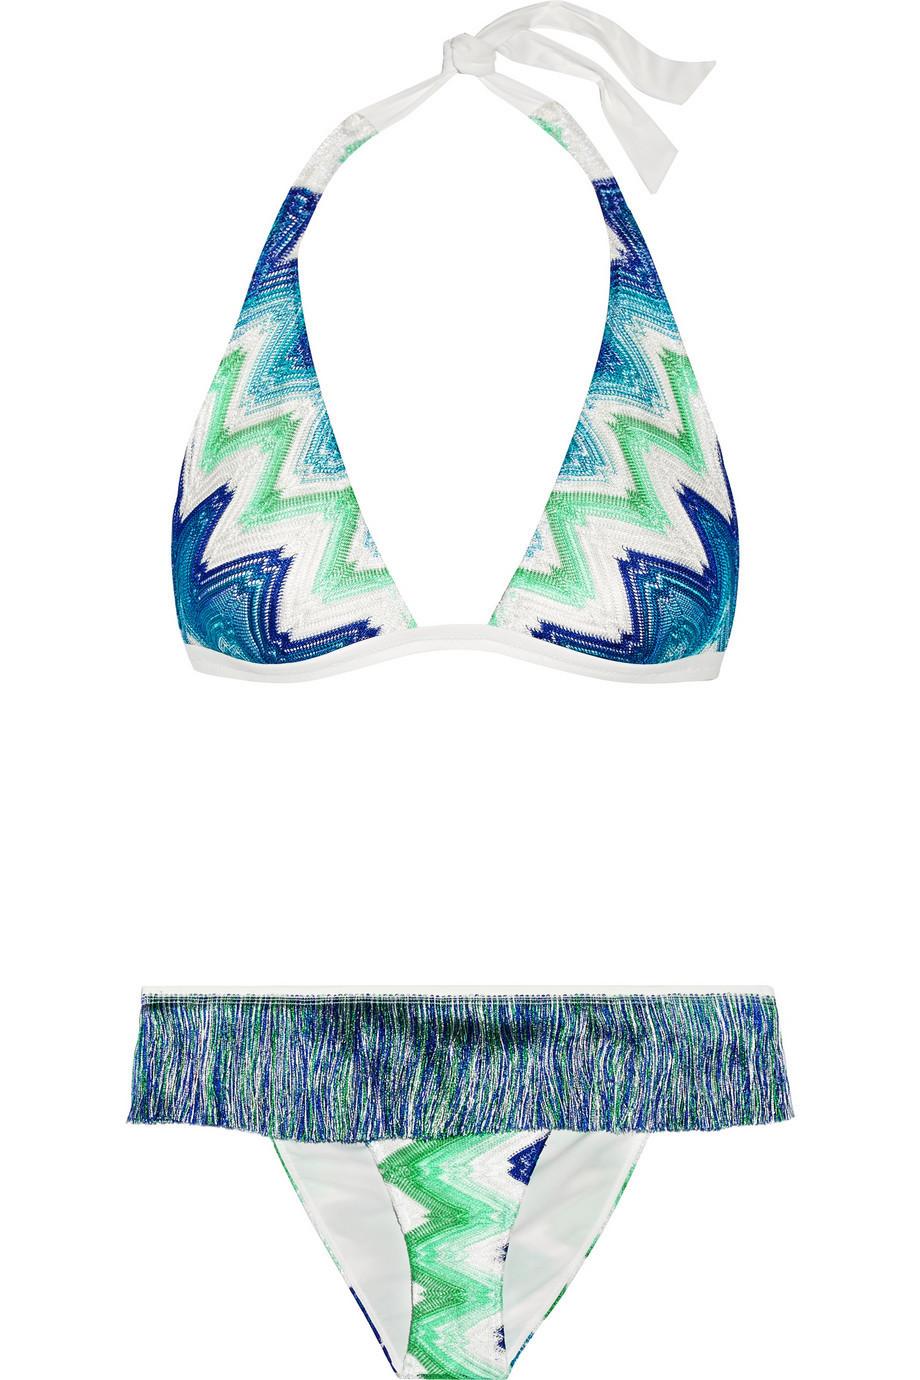 ff99a70068 Missoni Mare Fringed Crochet-Knit Halterneck Bikini in blue / mint